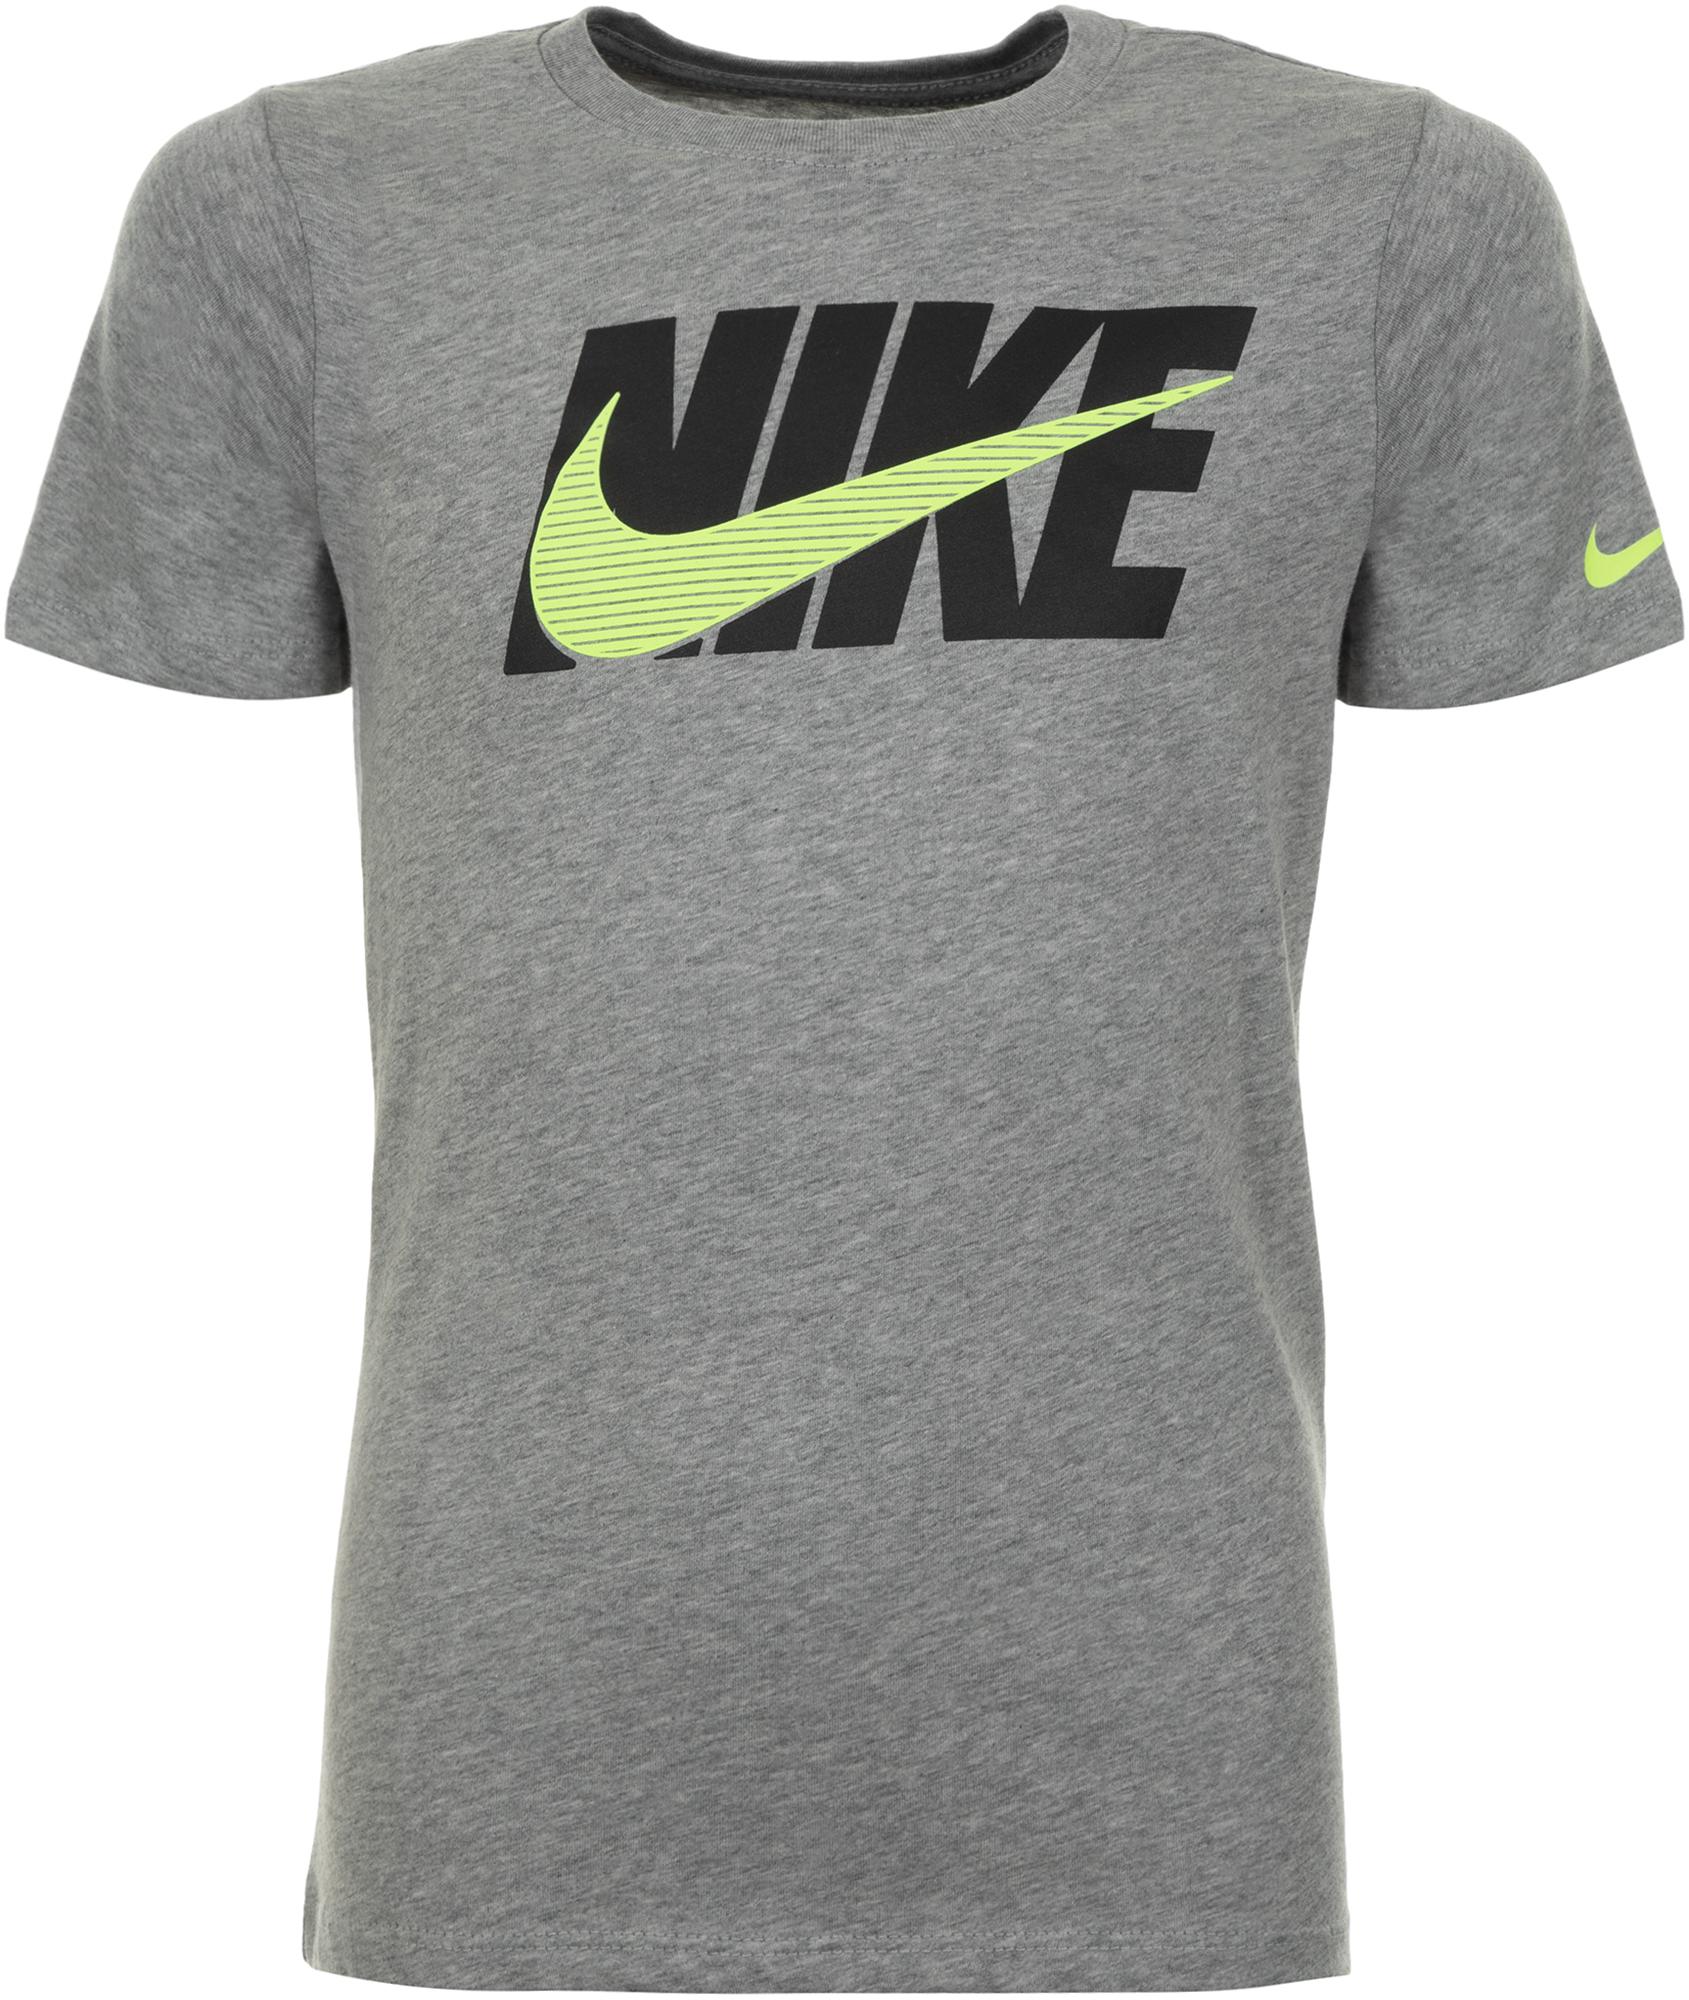 Nike Футболка для мальчиков Nike Sportswear, размер 147-158 цена